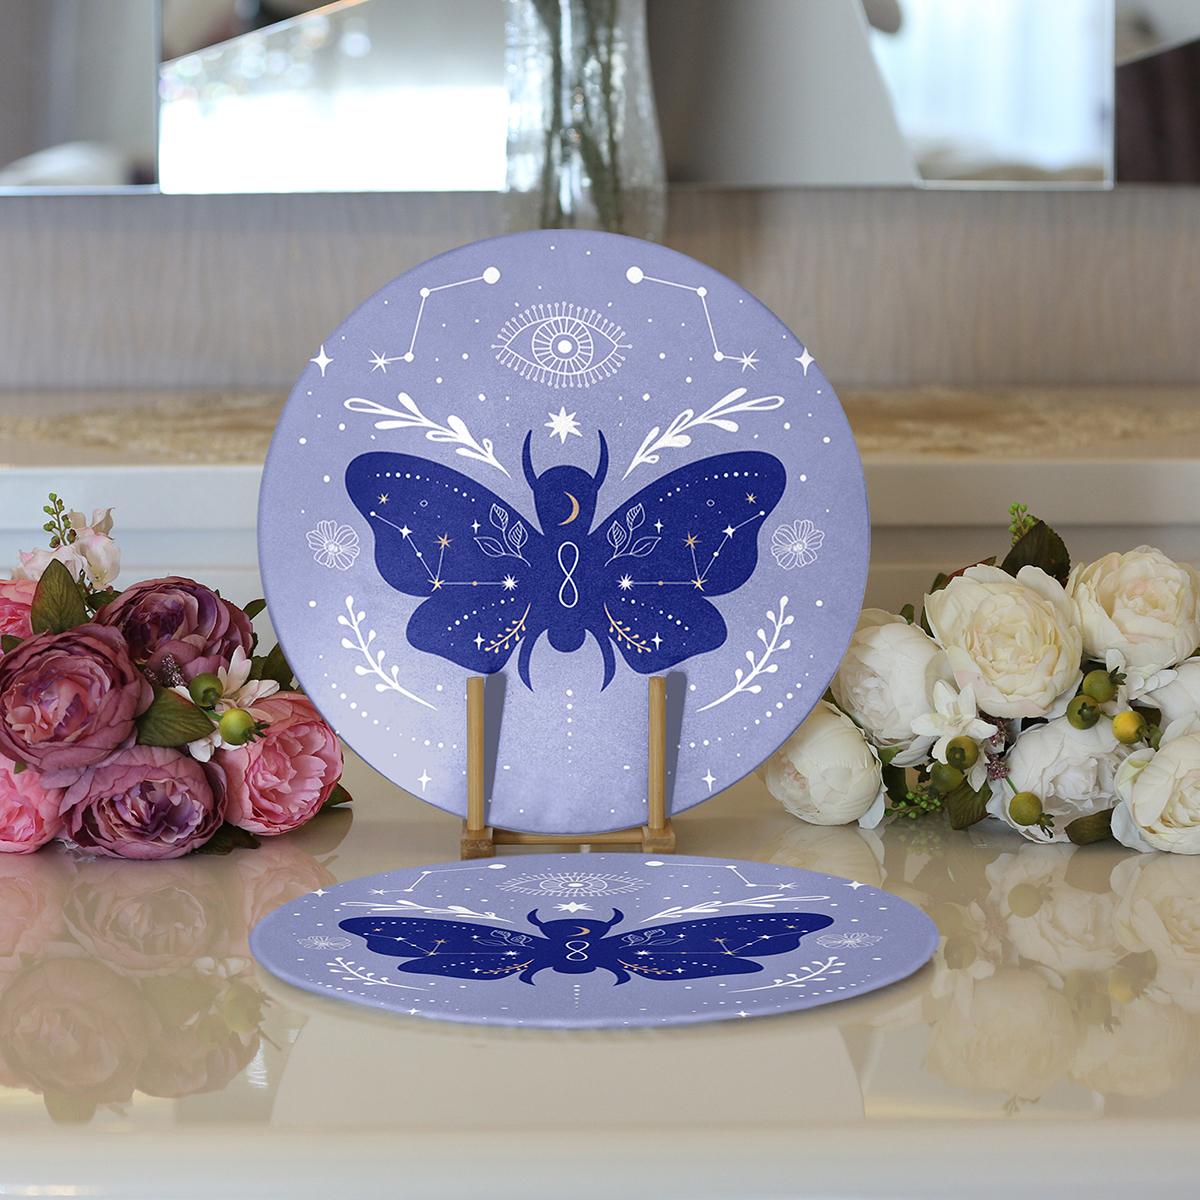 Realhomes Karolina Mavisi Zeminli Sonsuz Kelebek Desenli Modern 2'li Yuvarlak Servis Altlığı - Supla Realhomes